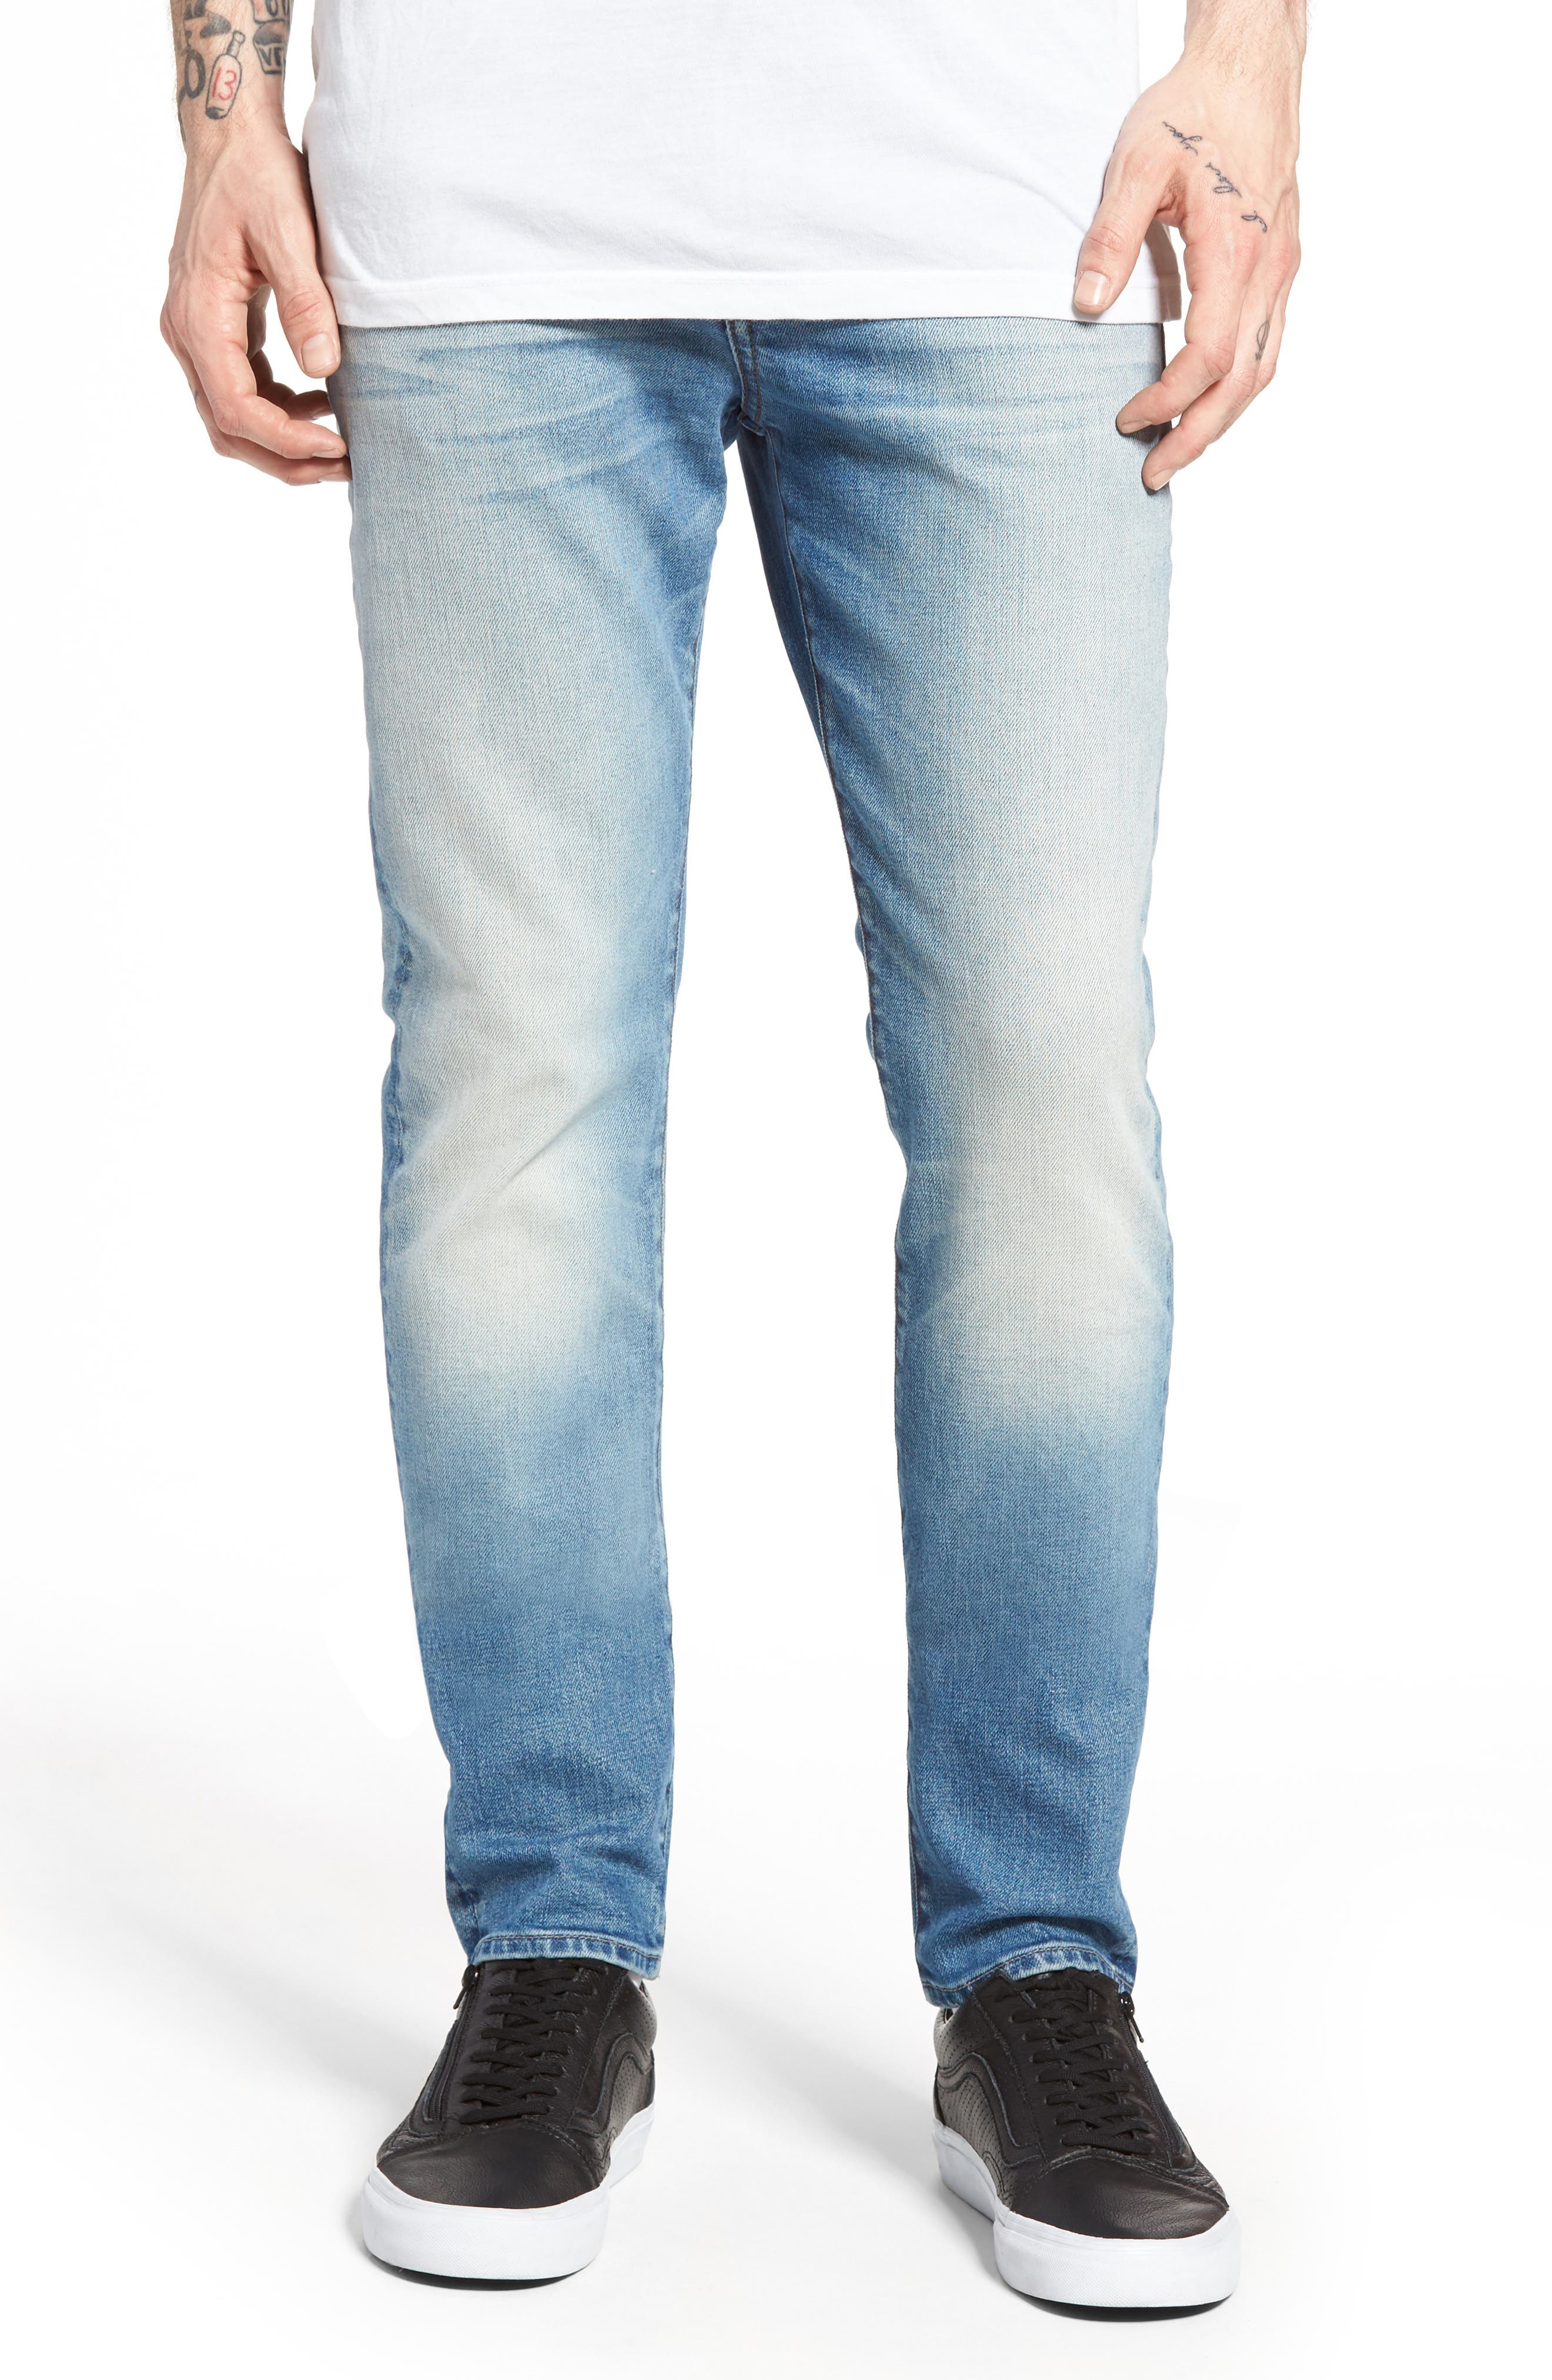 UB301 Straight Leg Raw Selvedge Jeans,                         Main,                         color, INDIGO